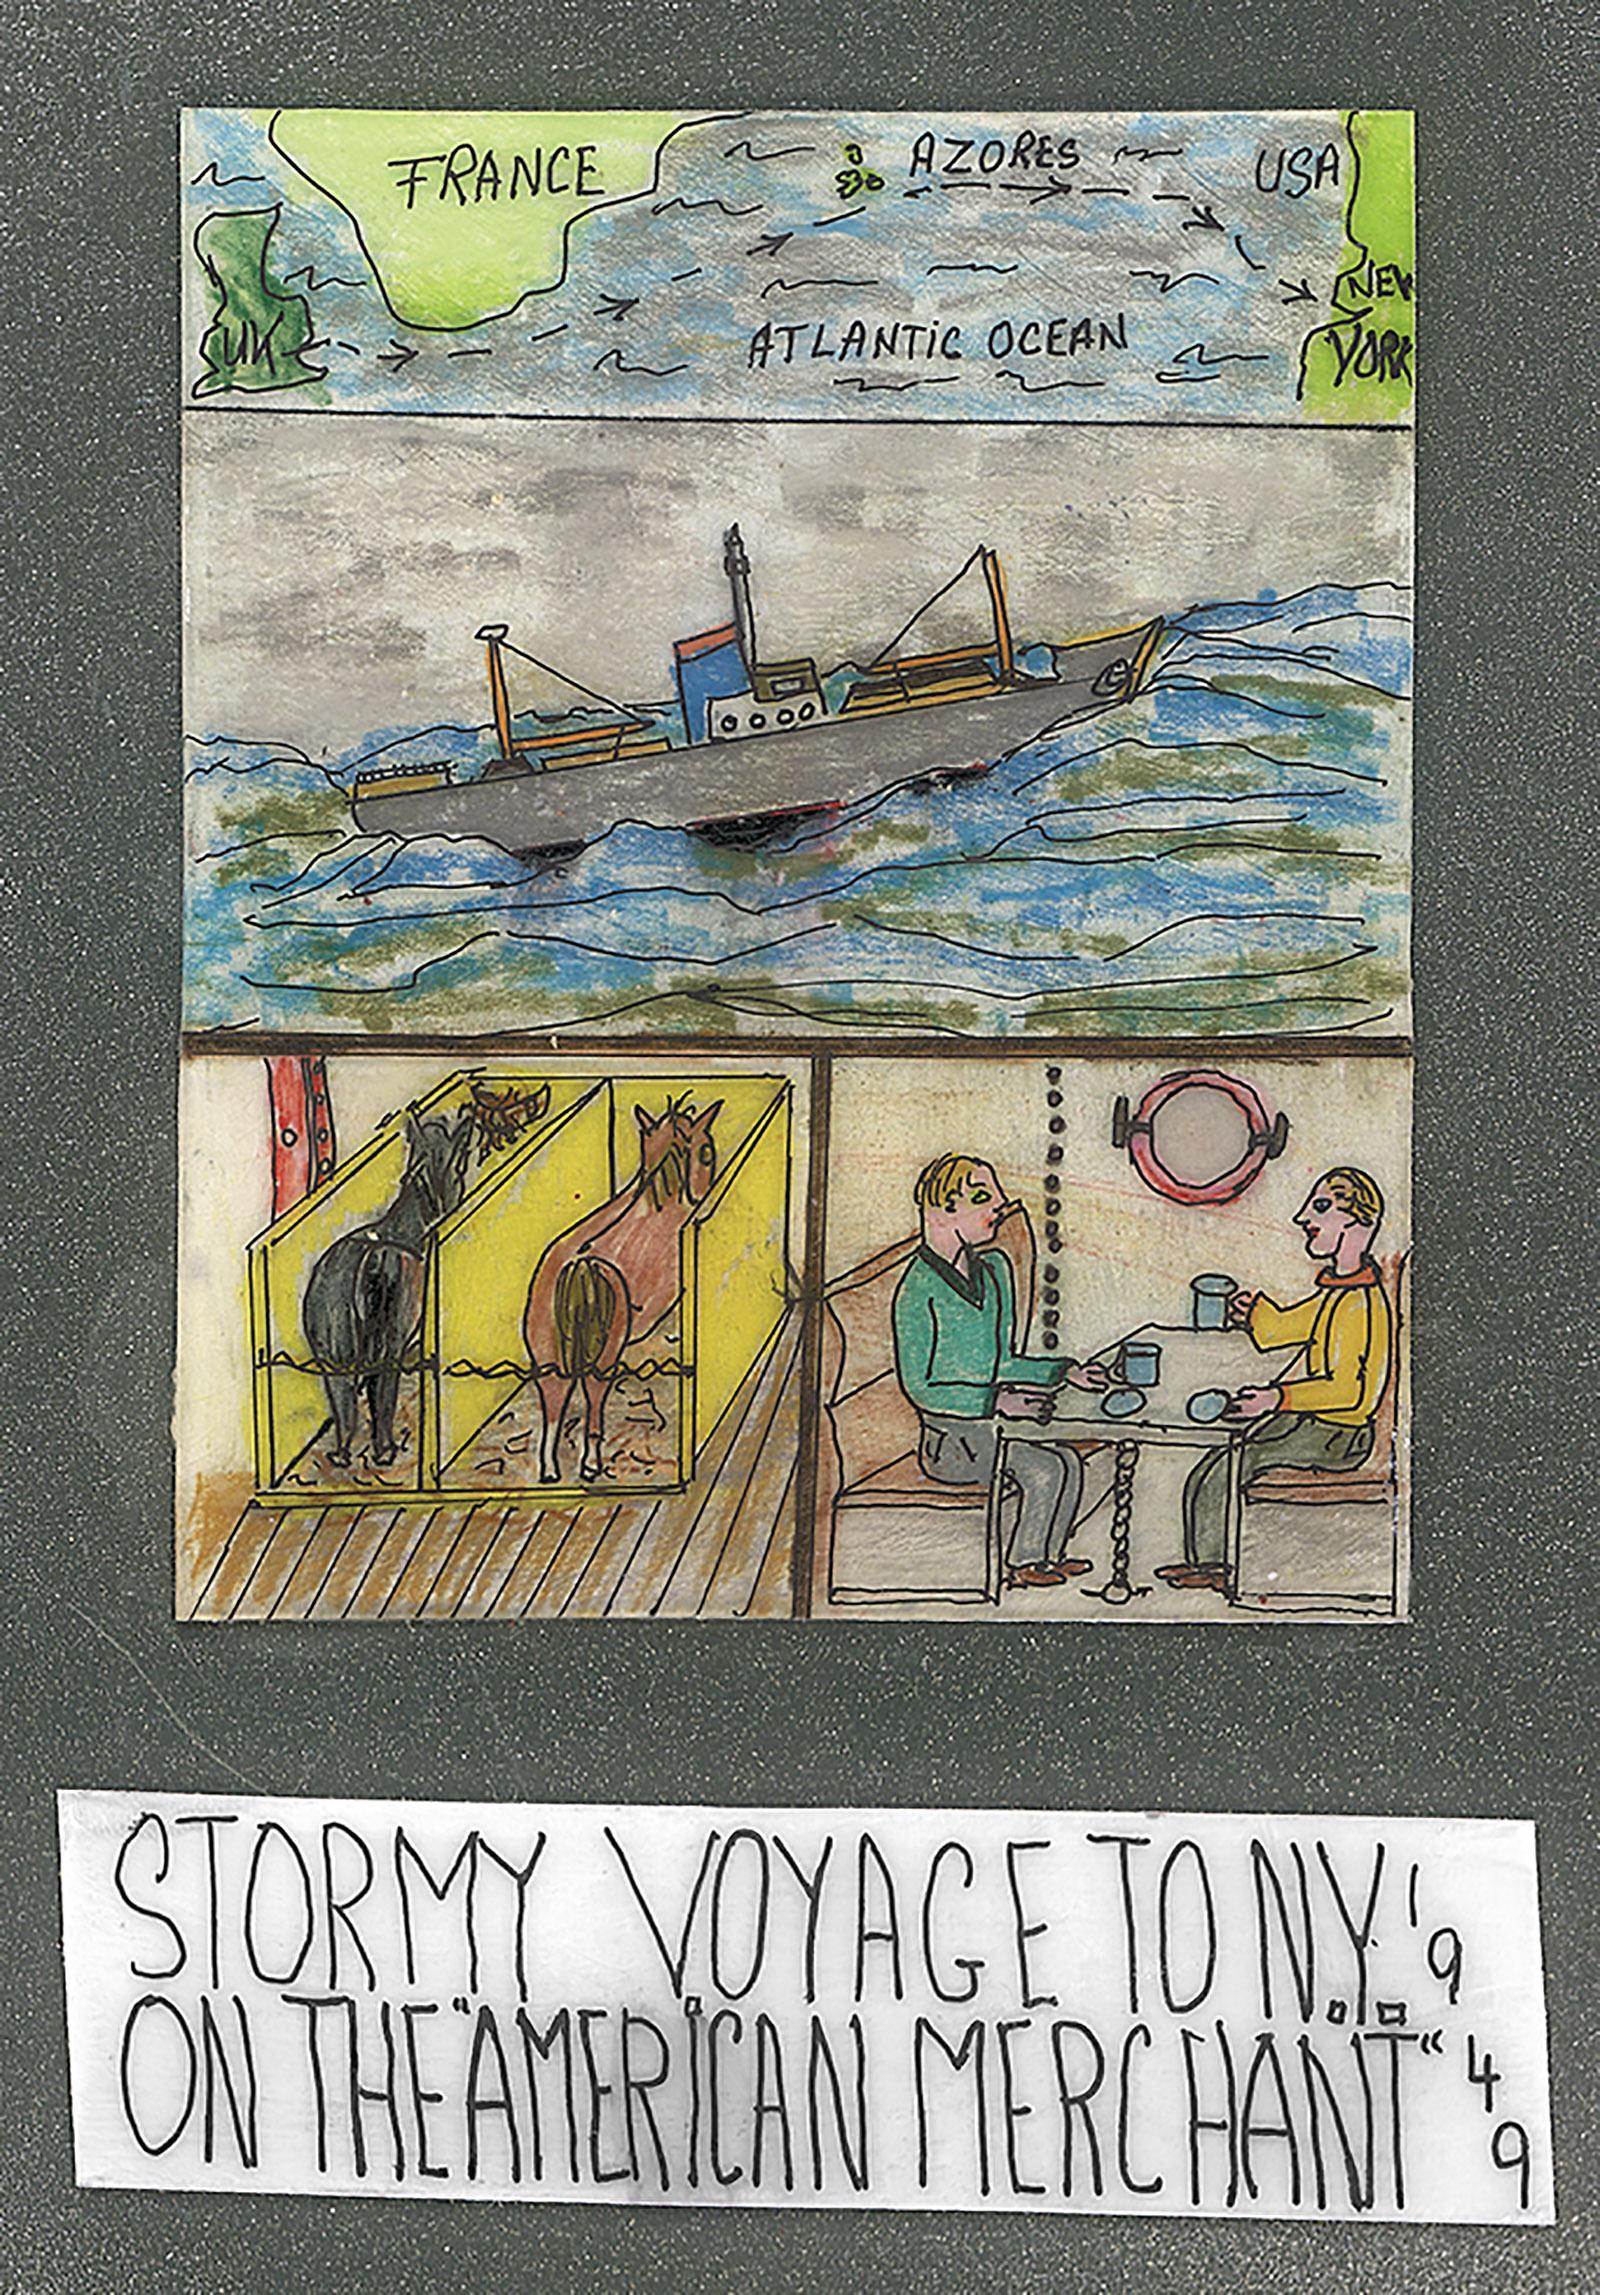 27. stormy voyage